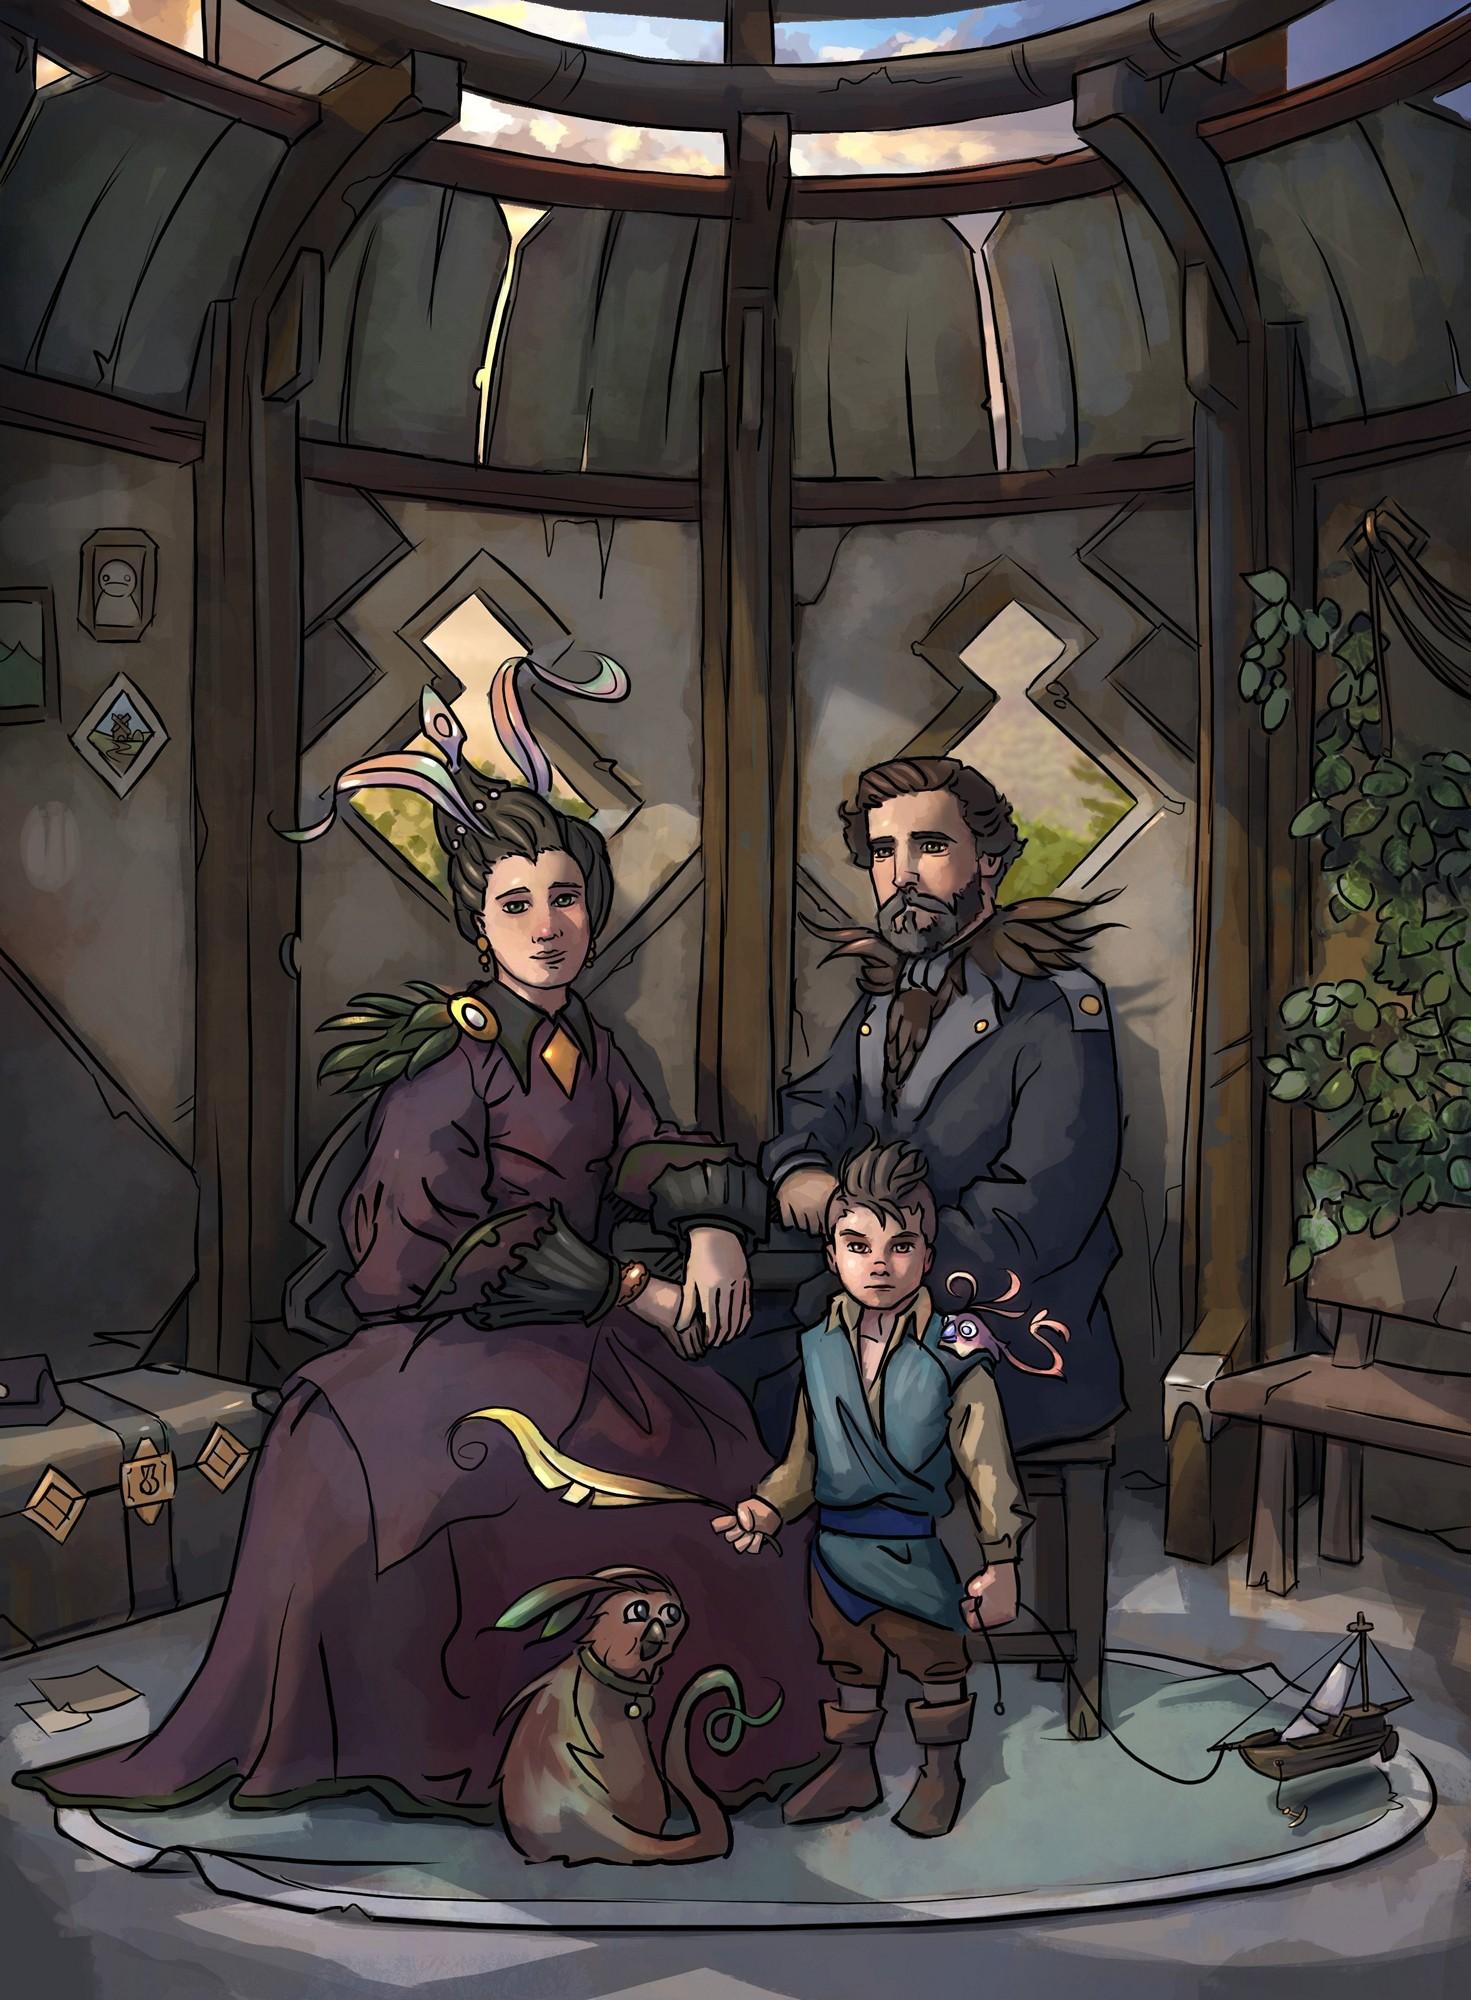 Finnick's family portrait